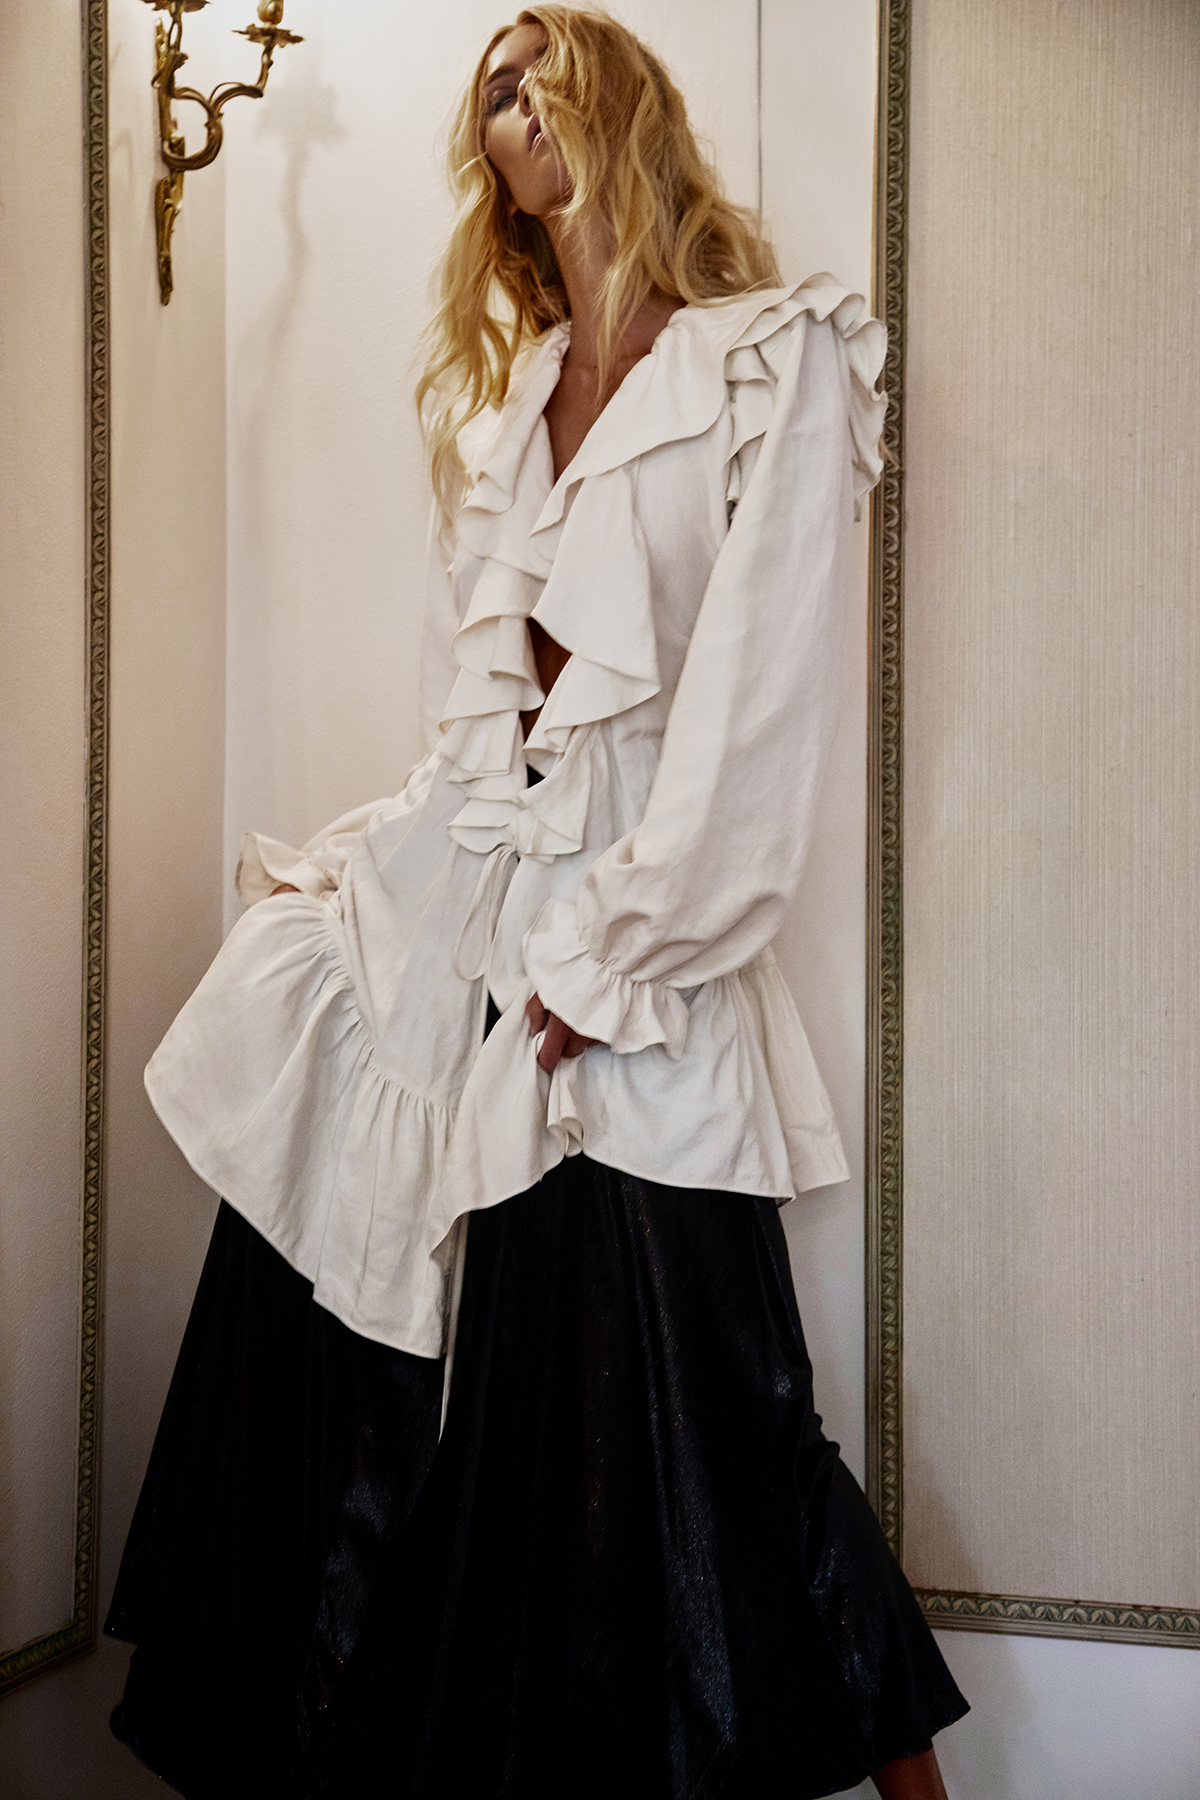 Elyse Knowles by Bonnie Hansen 2018 7 .jpg